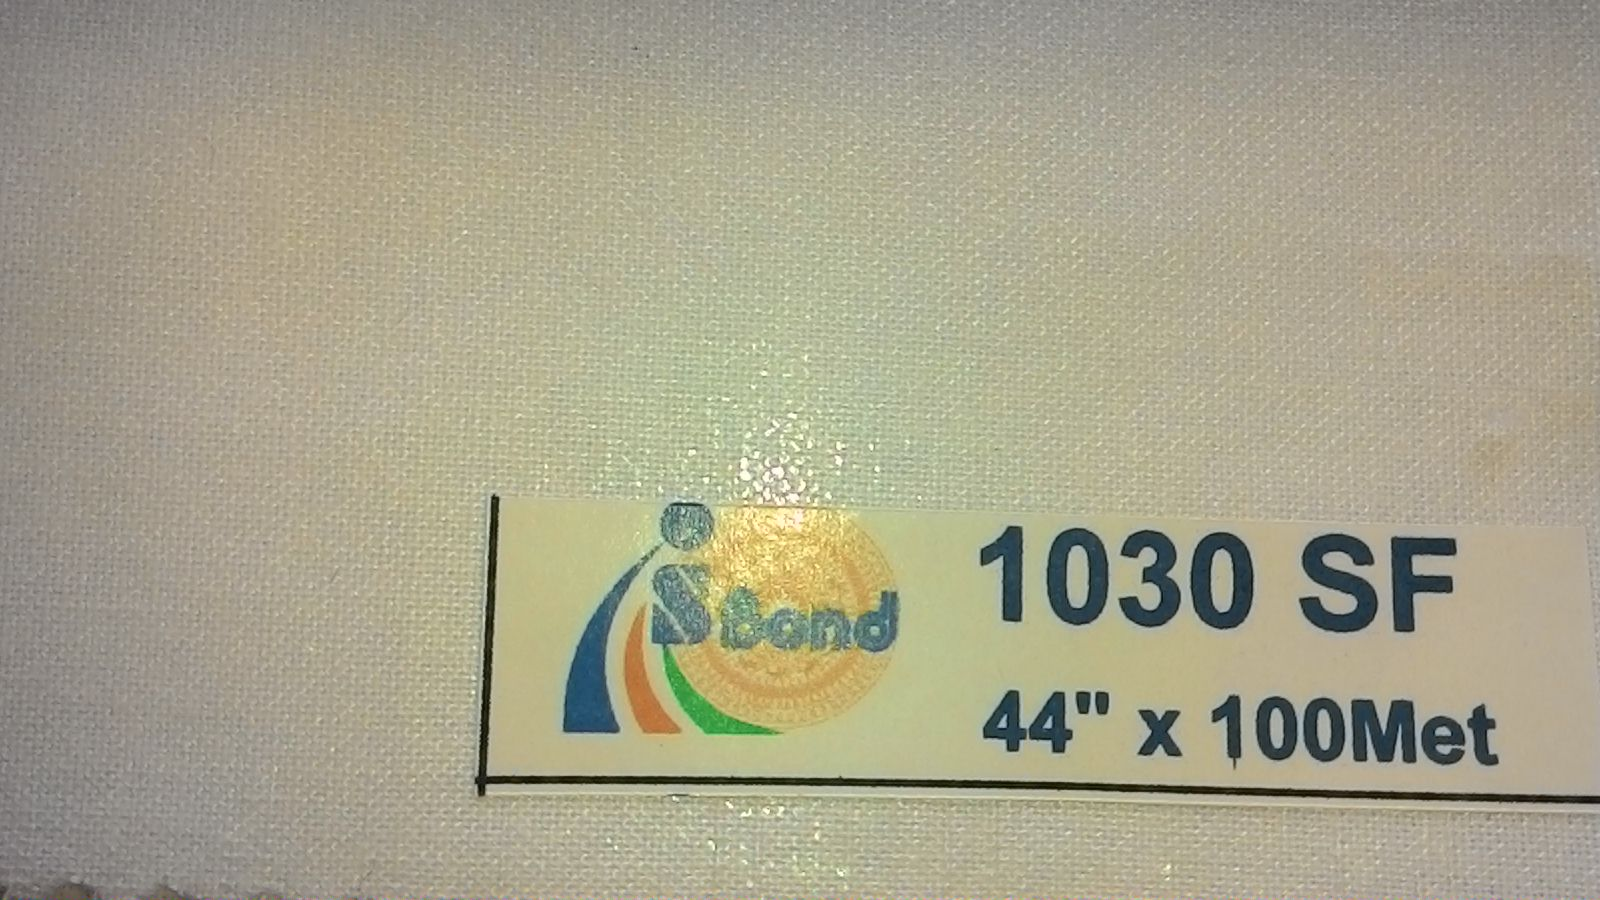 KEO VẢI # 1030HF